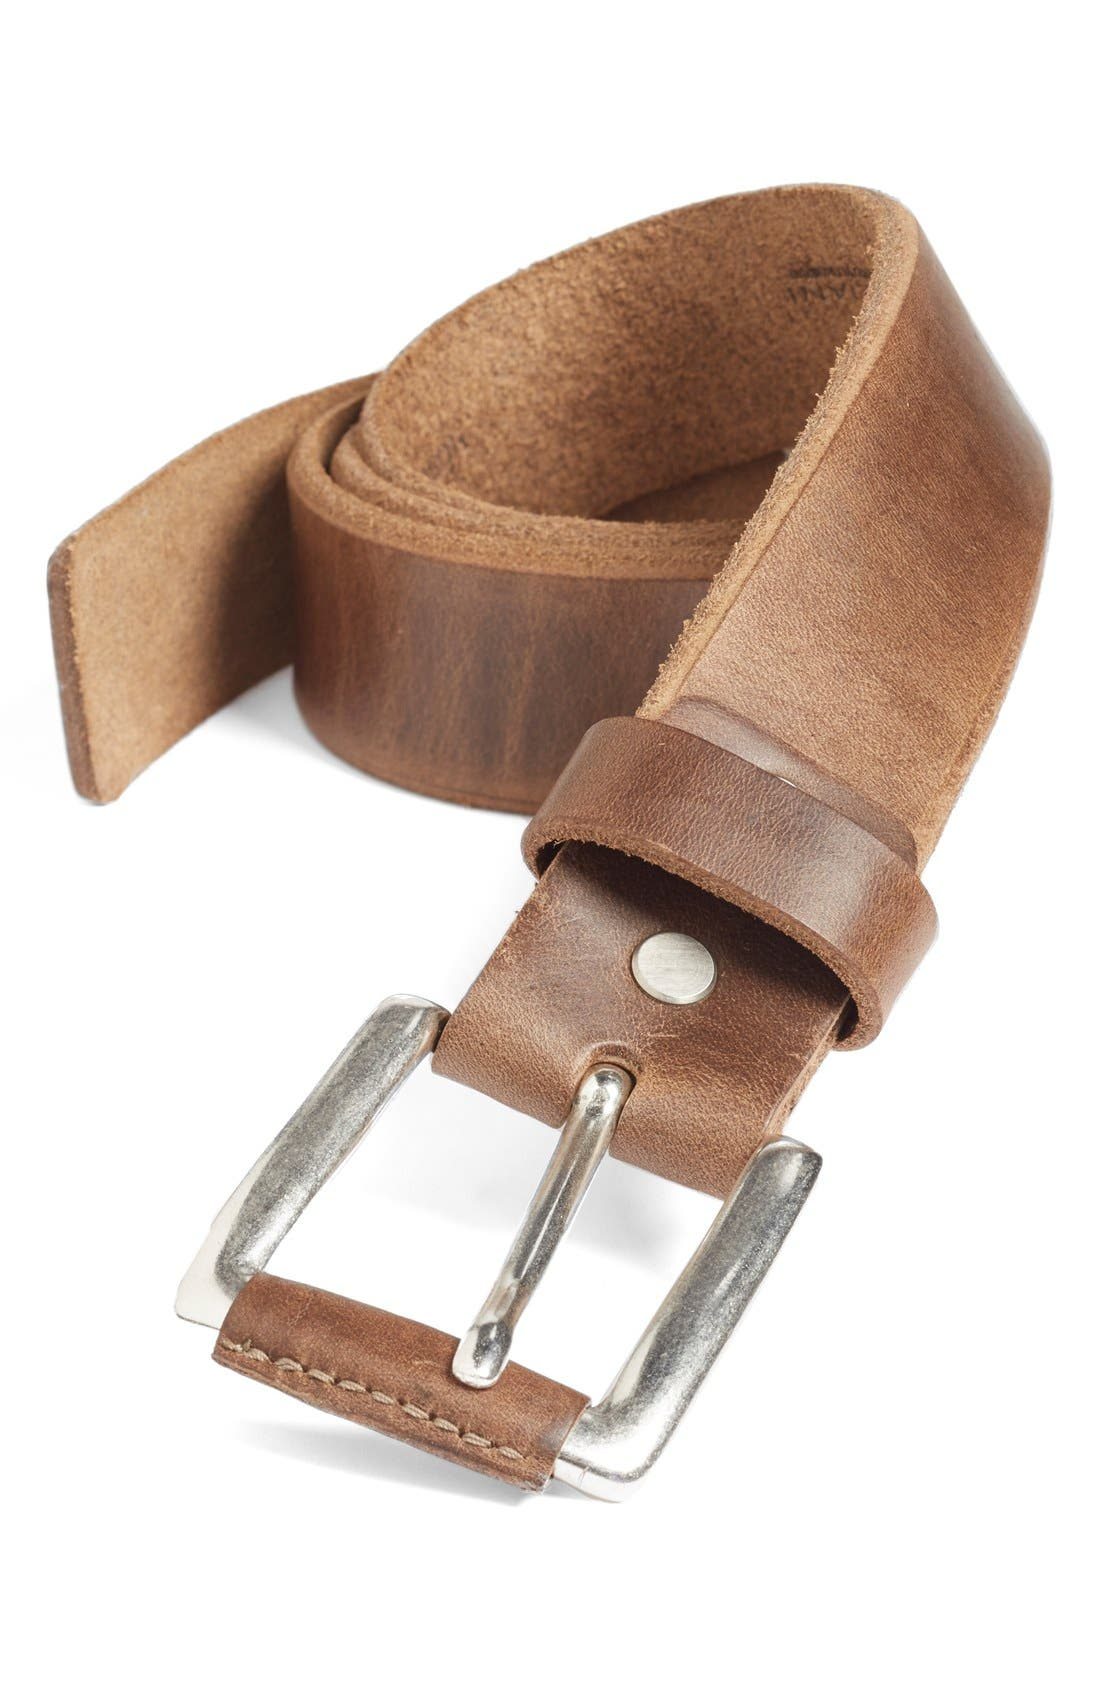 'Coraggio' Leather Belt,                             Main thumbnail 1, color,                             Natural